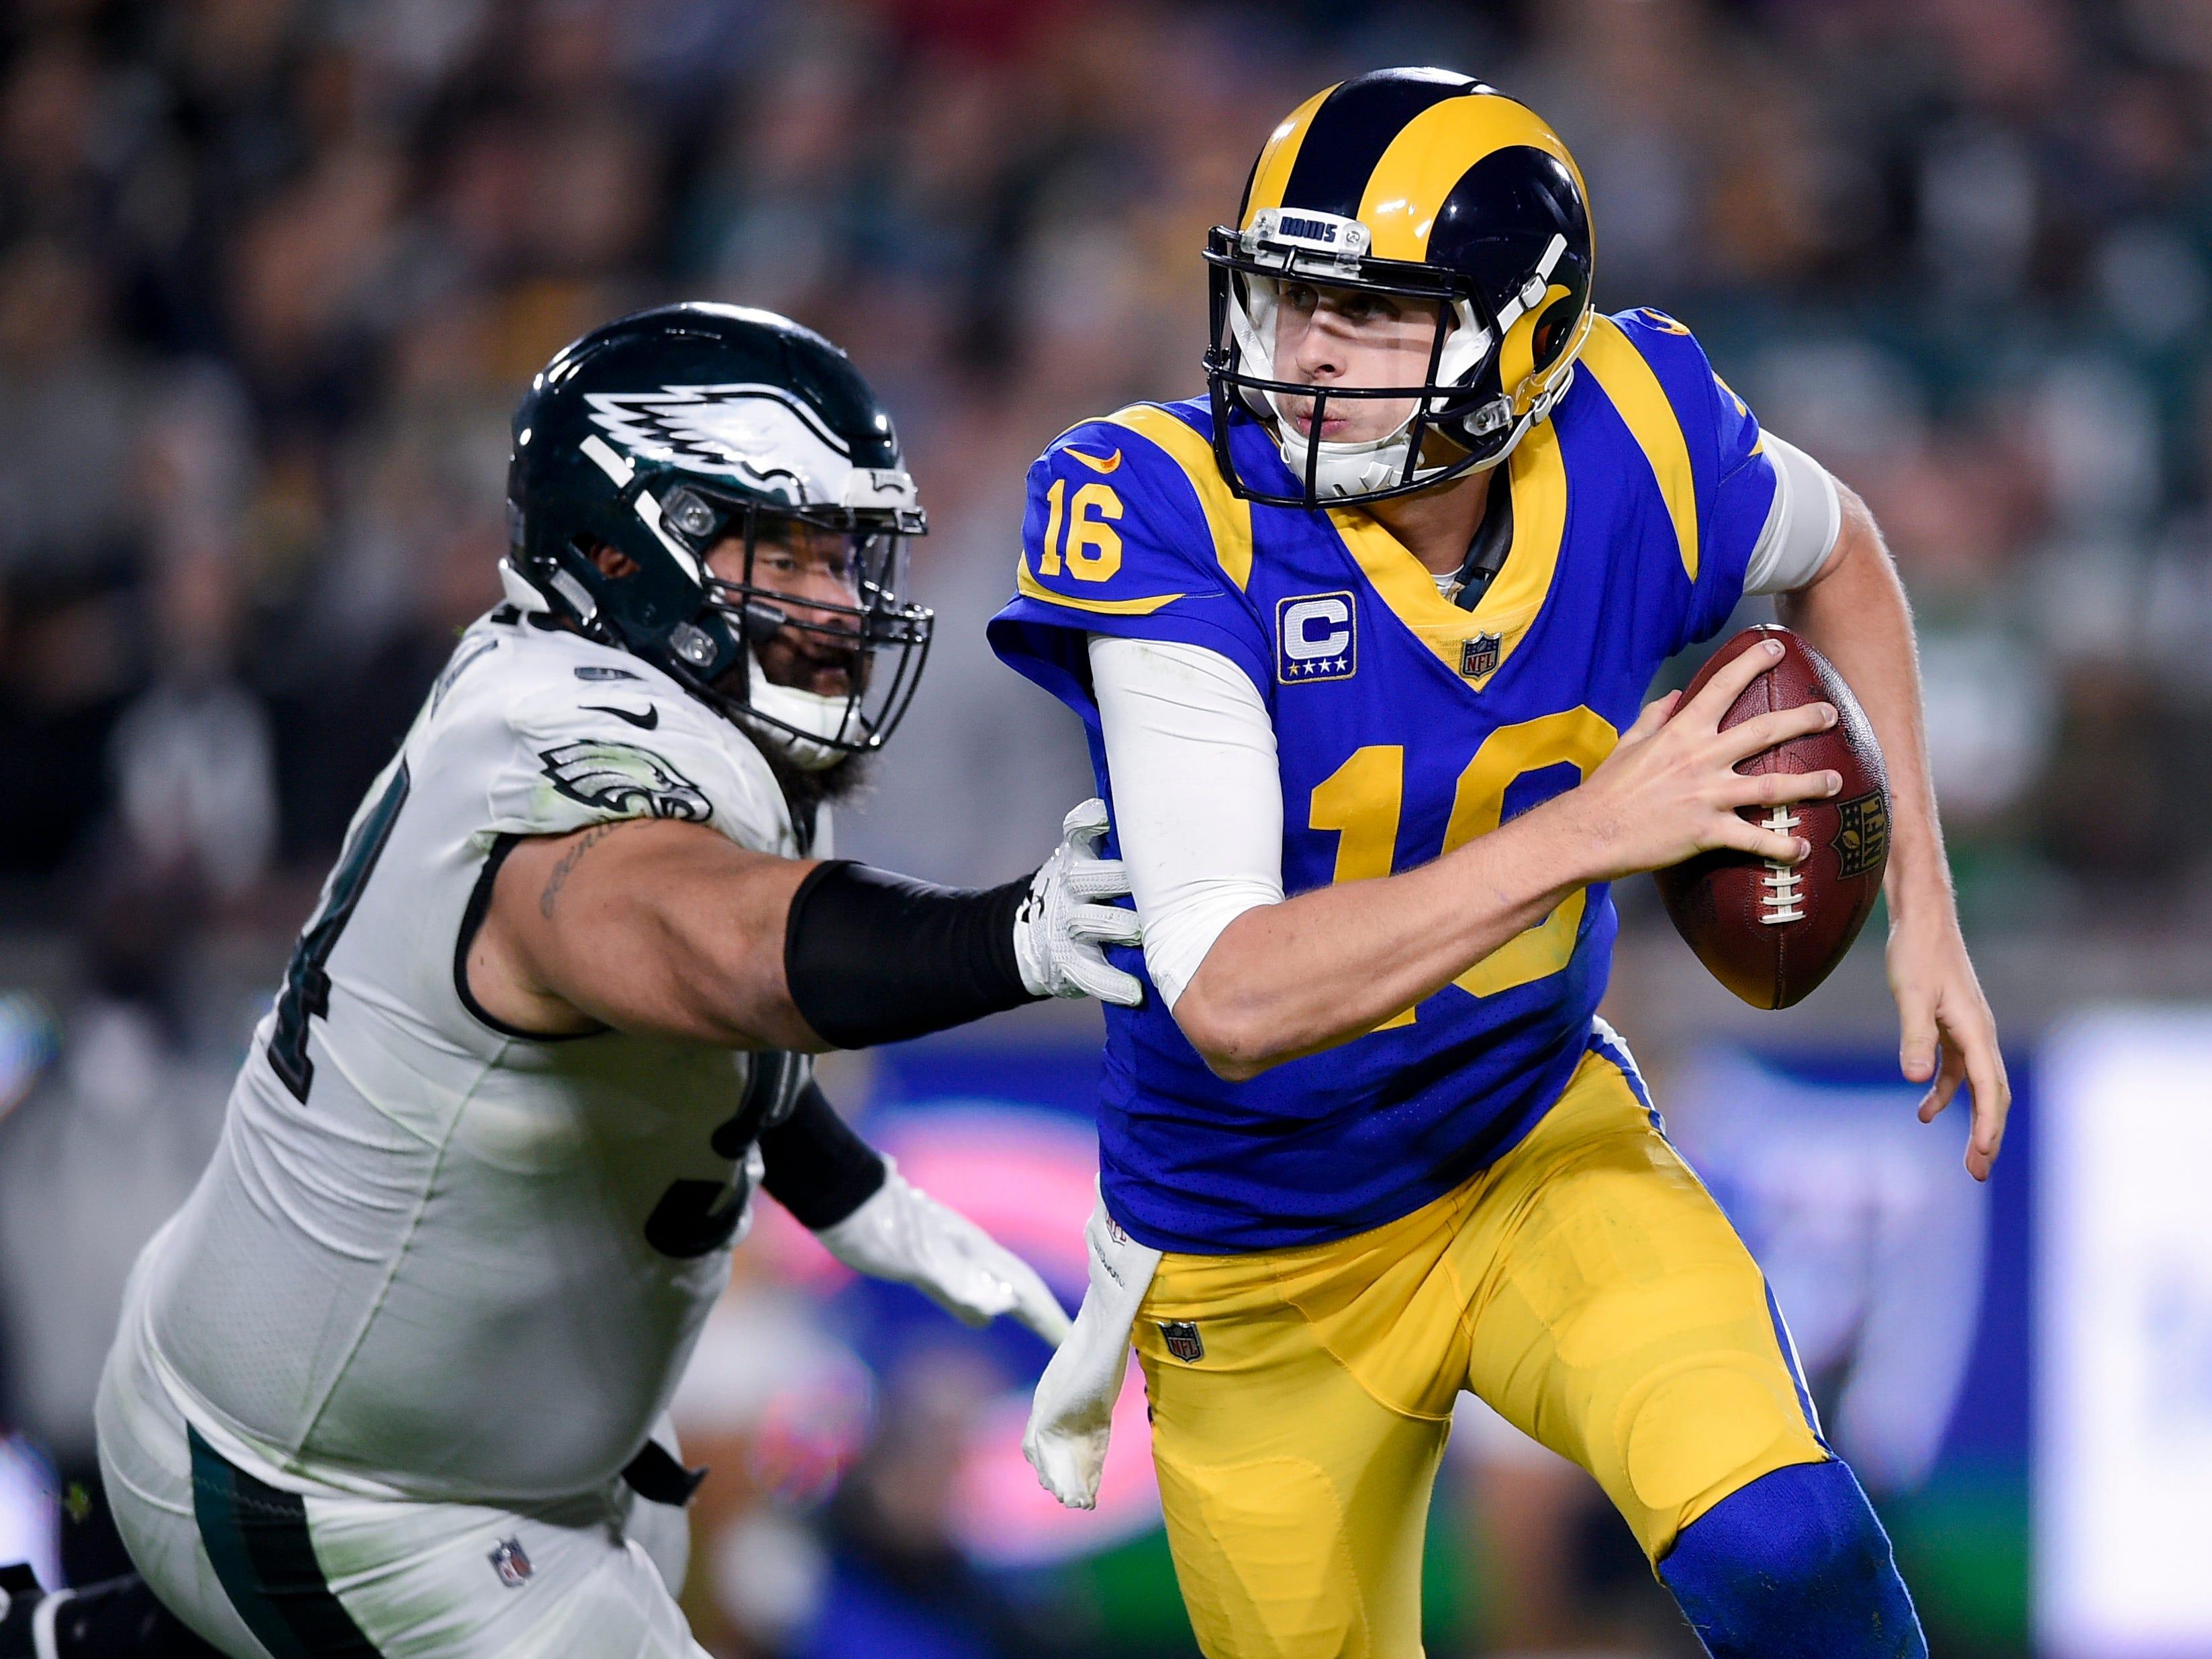 Philadelphia Eagles defensive tackle Haloti Ngata pressures Los Angeles Rams quarterback Jared Goff during the second half at Los Angeles Memorial Coliseum.